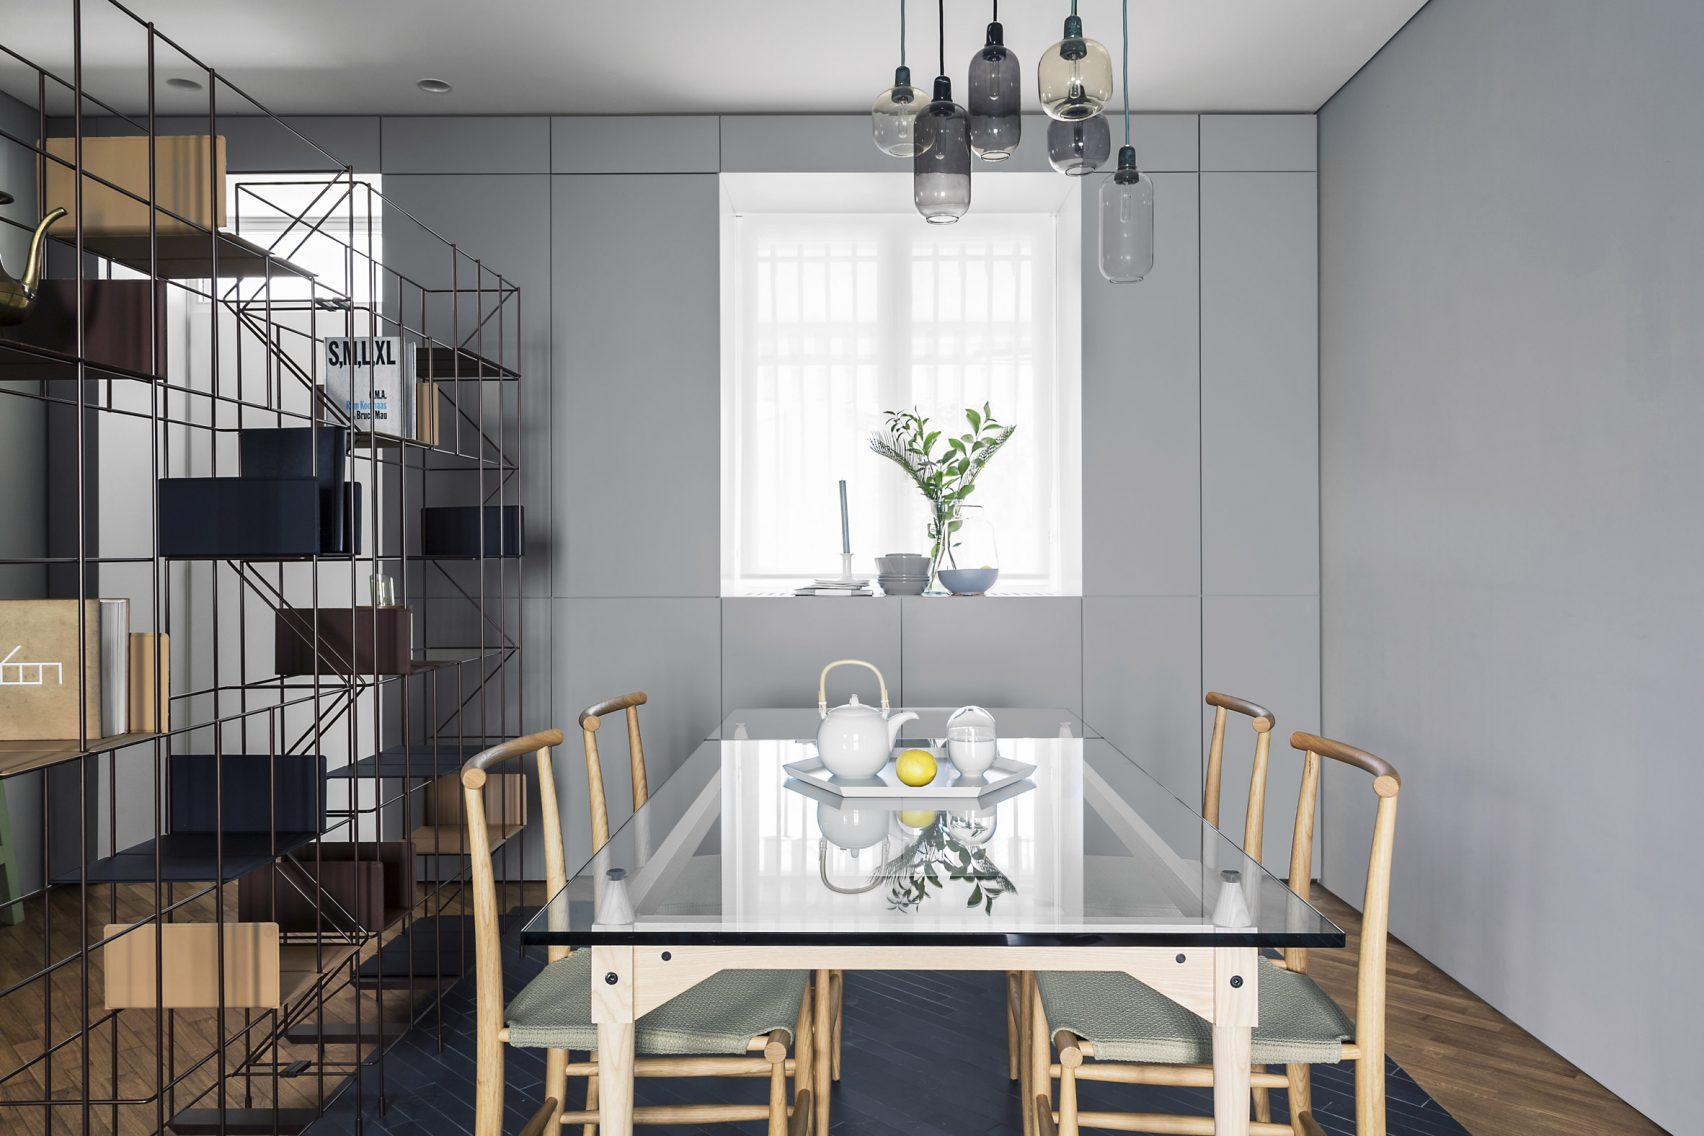 Keuken Wandkast 7 : Strakke moderne keuken met blauwe wandkast en zwart kookeiland